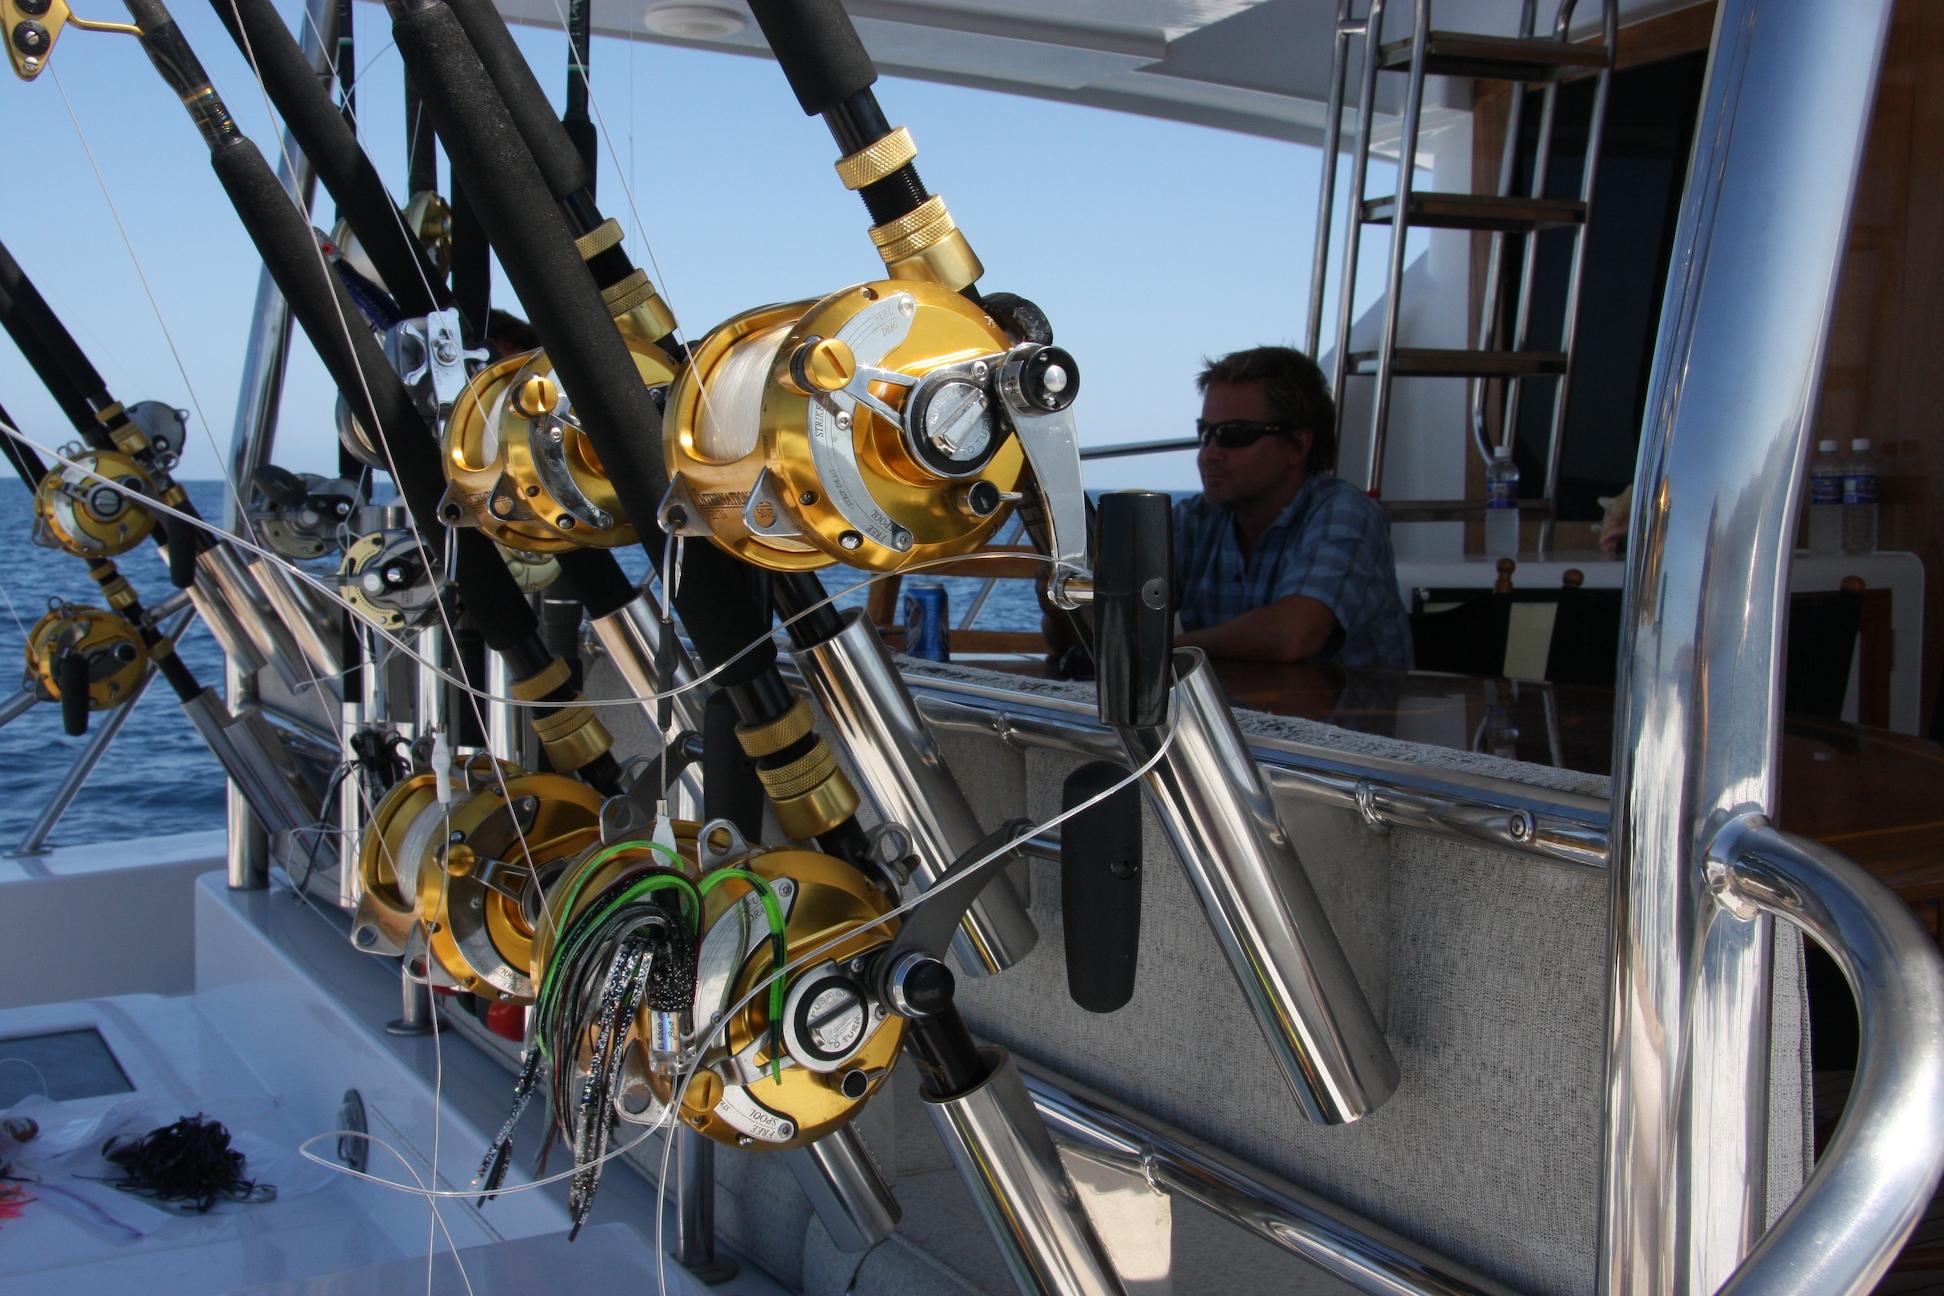 sea fishing equipment, Reel Combo